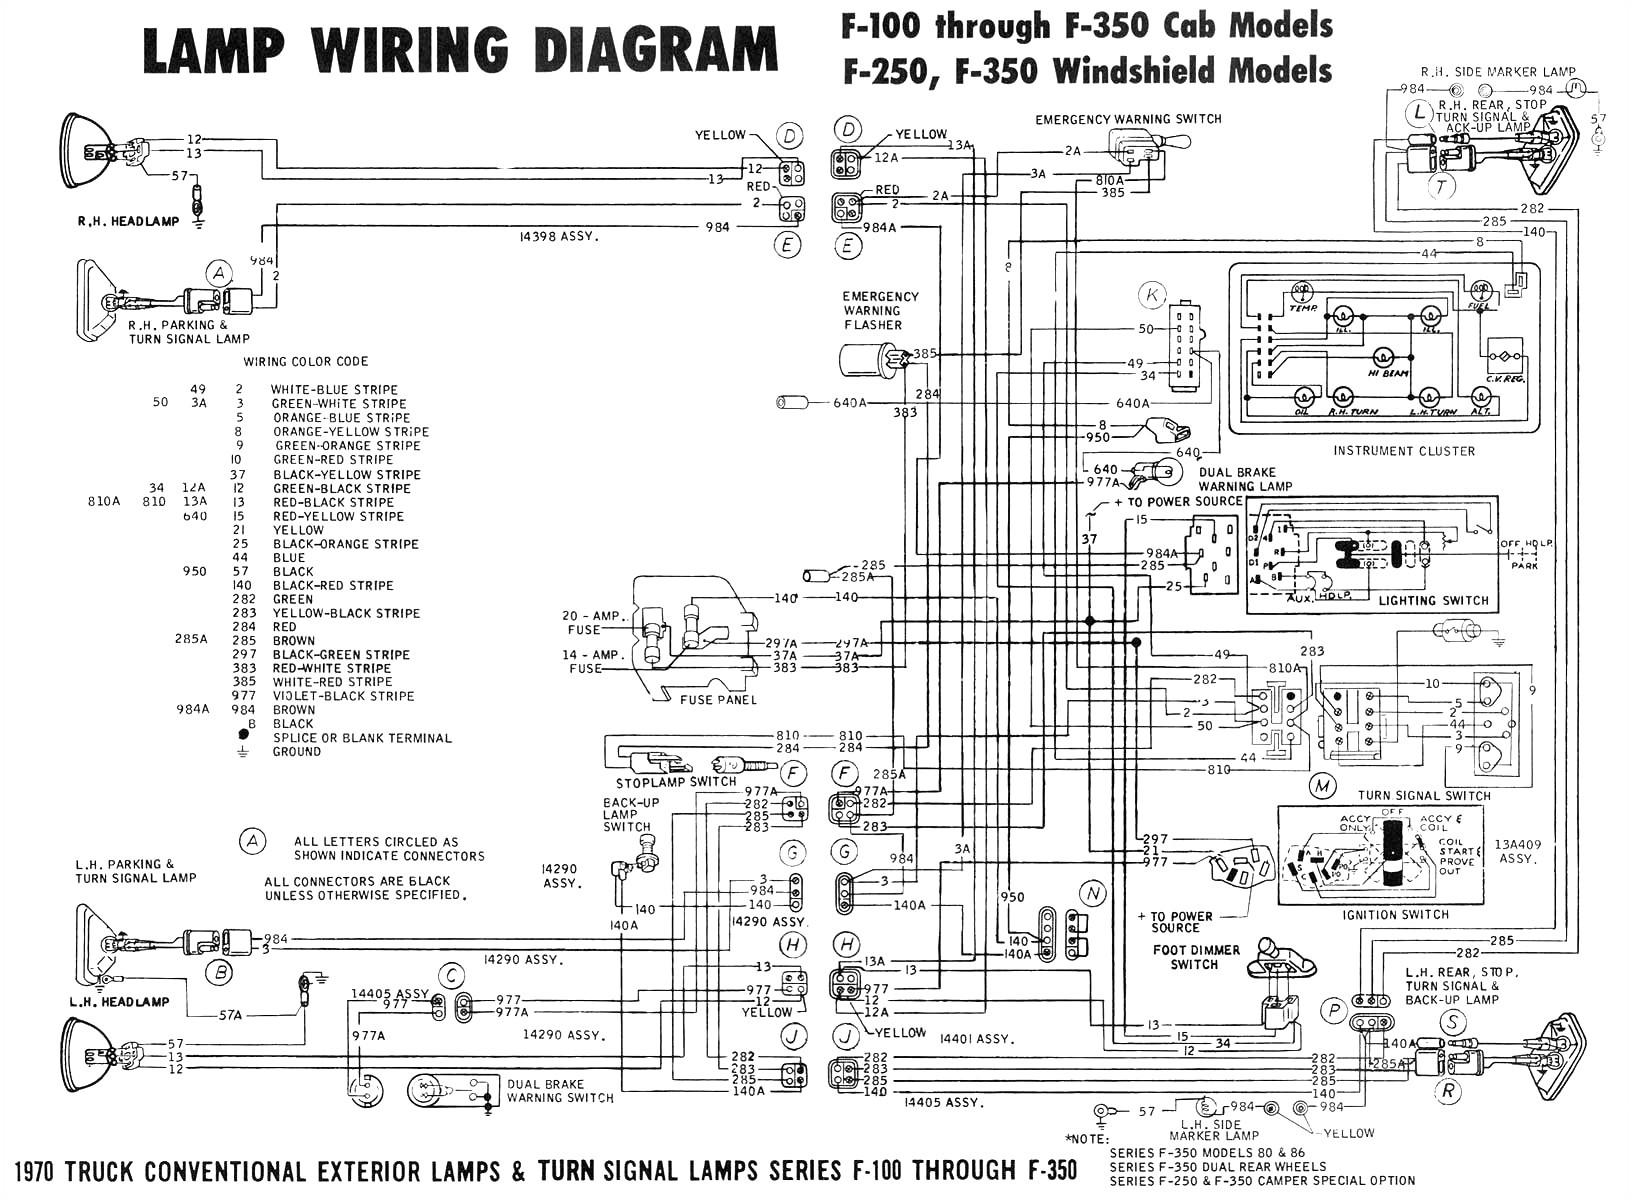 2005 mustang door wiring diagram home wiring diagram besides stereo wiring harness diagram on 78 mustang solenoid wiring